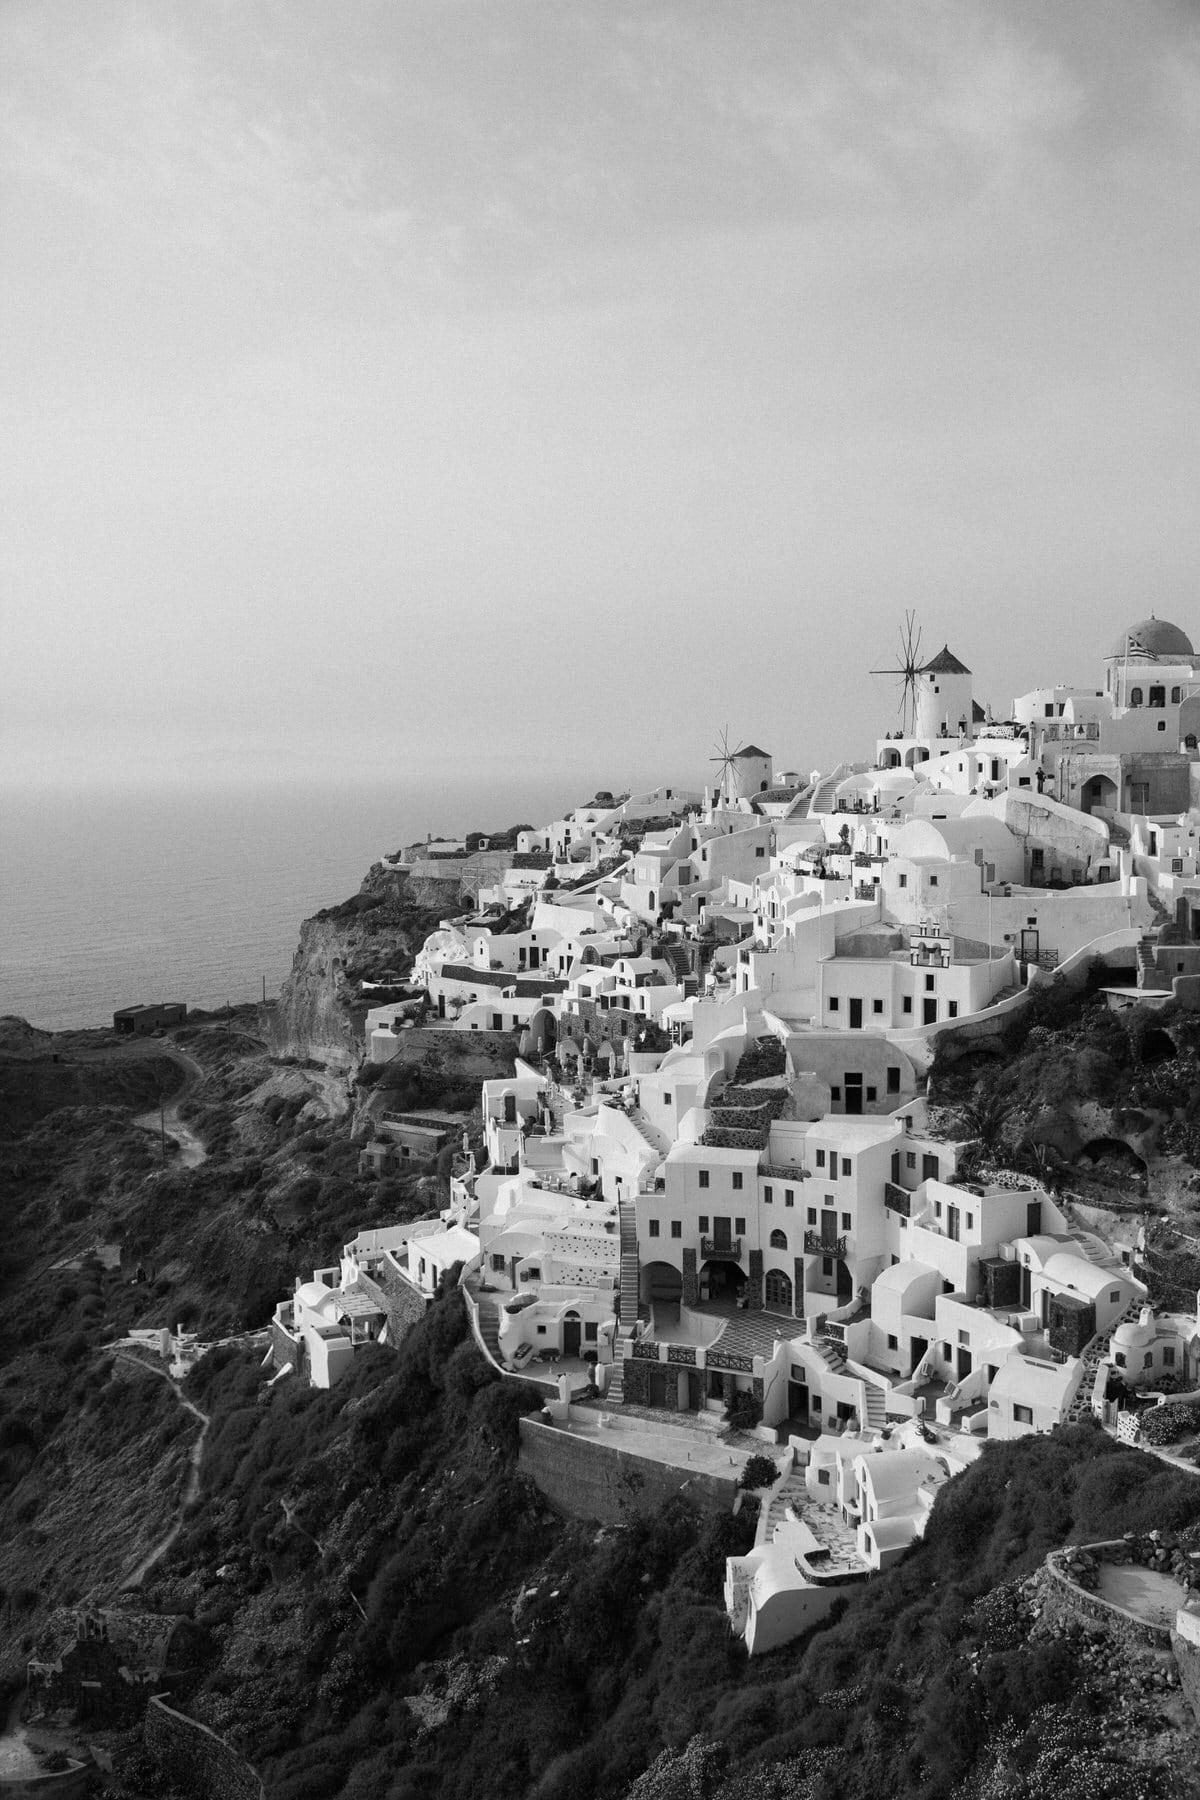 Santorini-Greece-black-and-white-fine-art-photography-by-Studio-L-photographer-Laura-Schneider-_2942